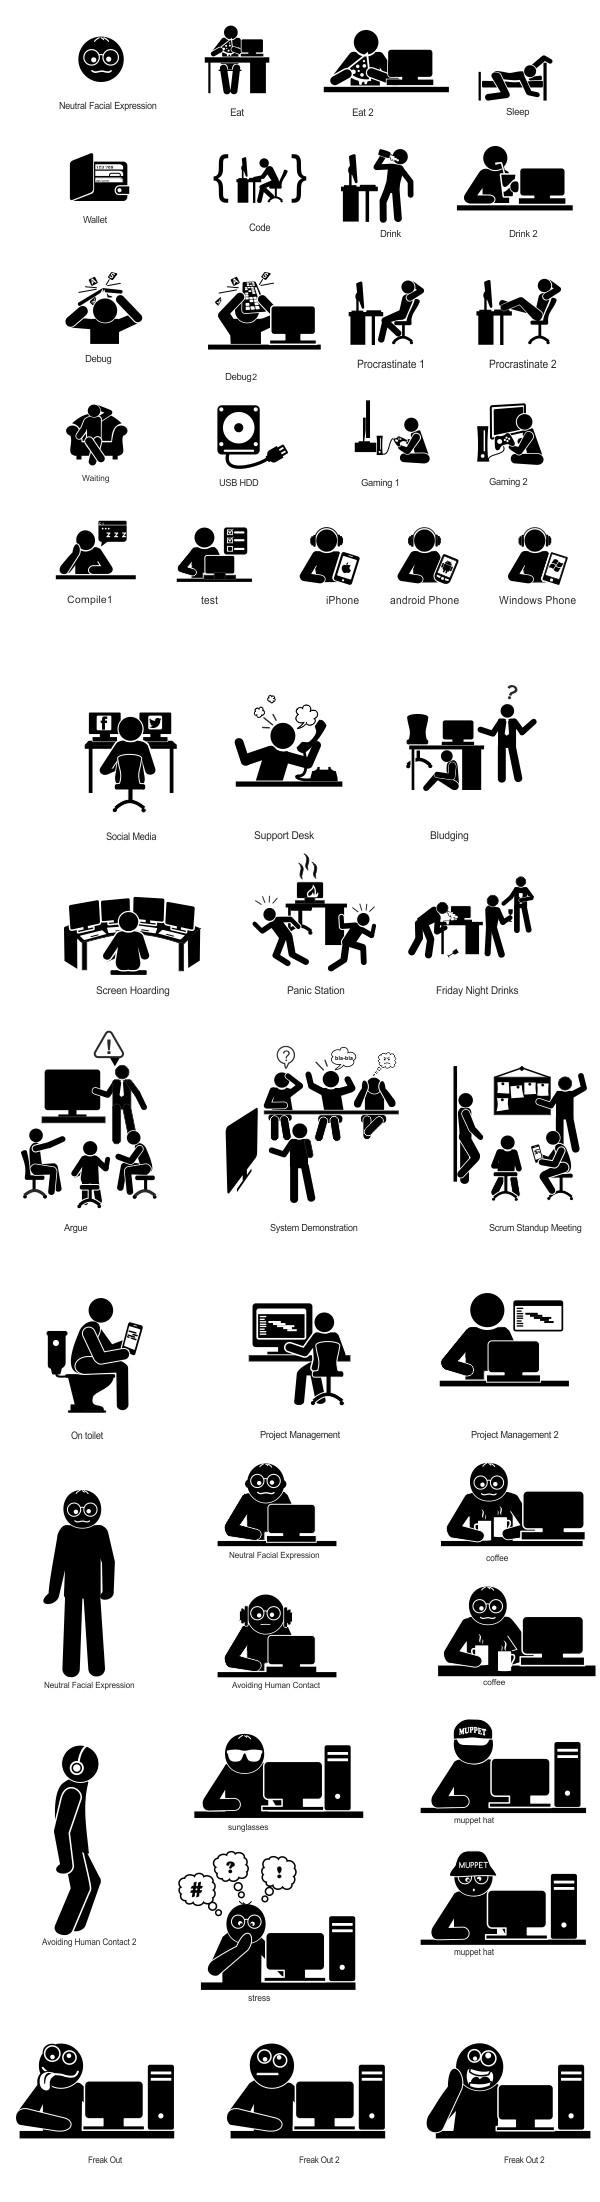 Set of Pictograms and Header image for { nerdWear; } website